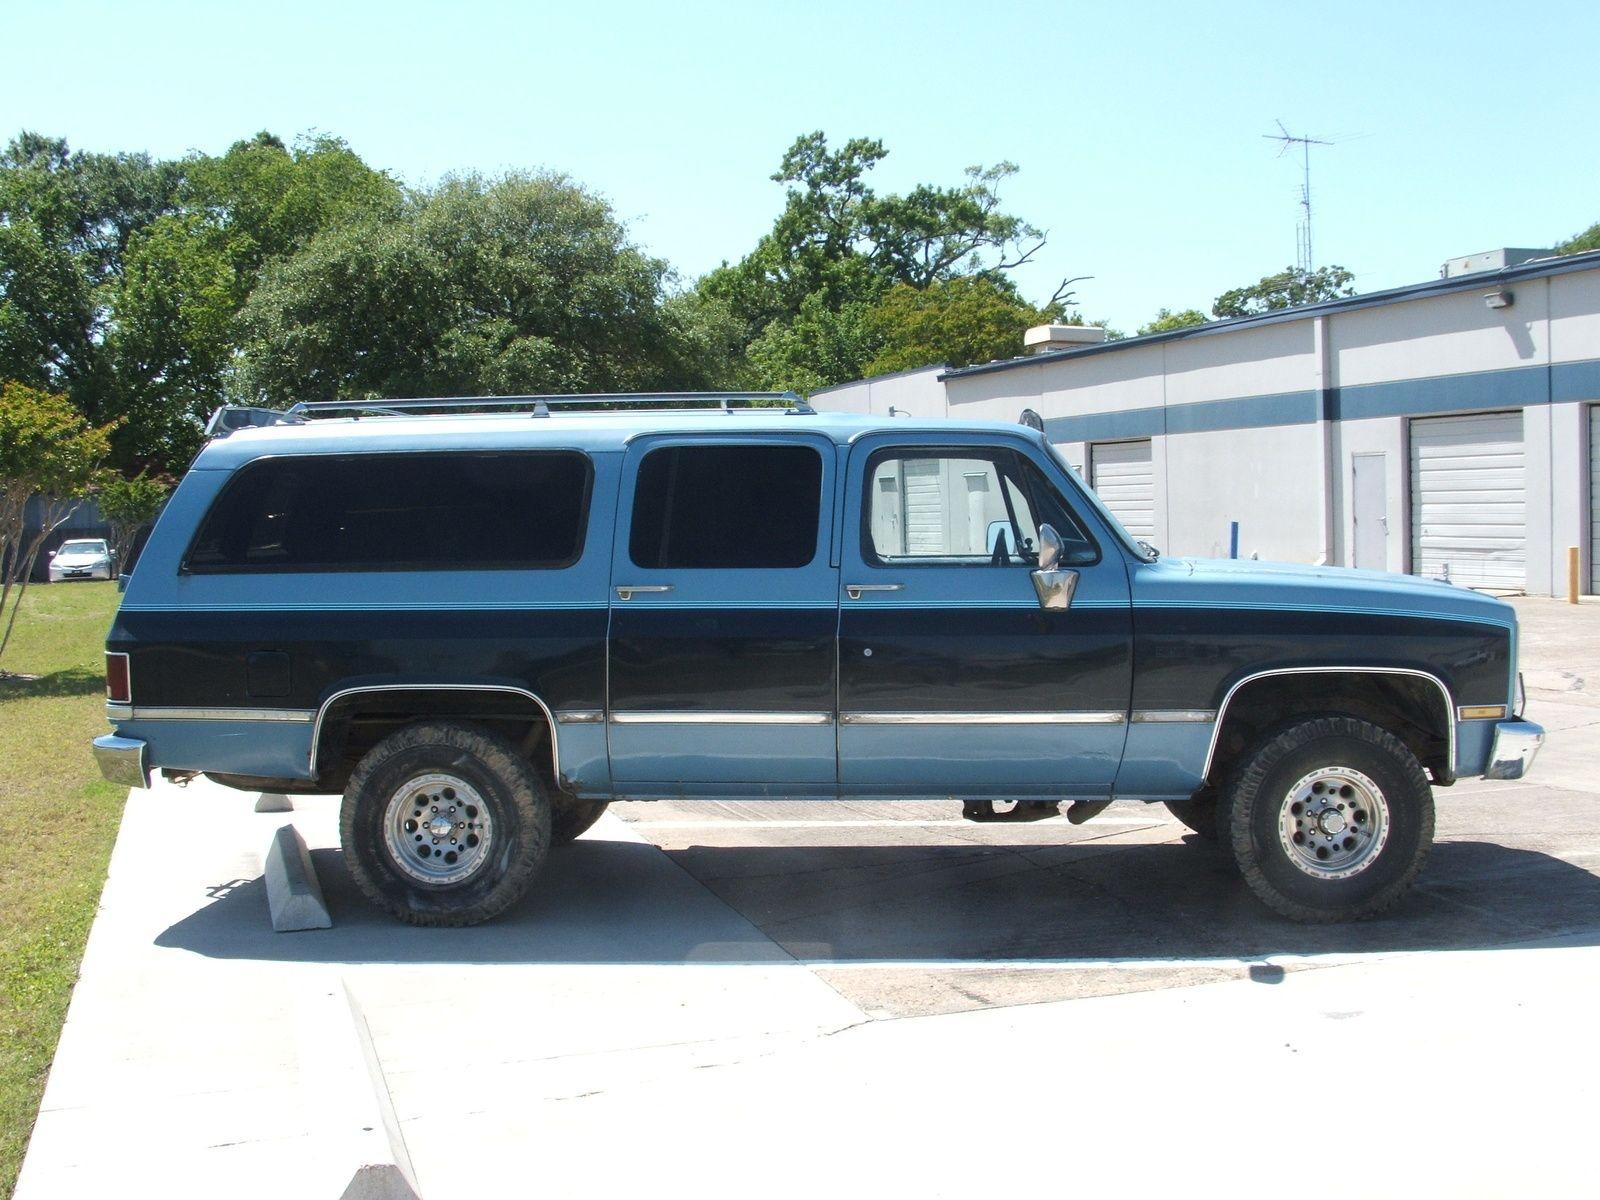 Chevrolet suburban 1987 chevrolet suburban picture exterior